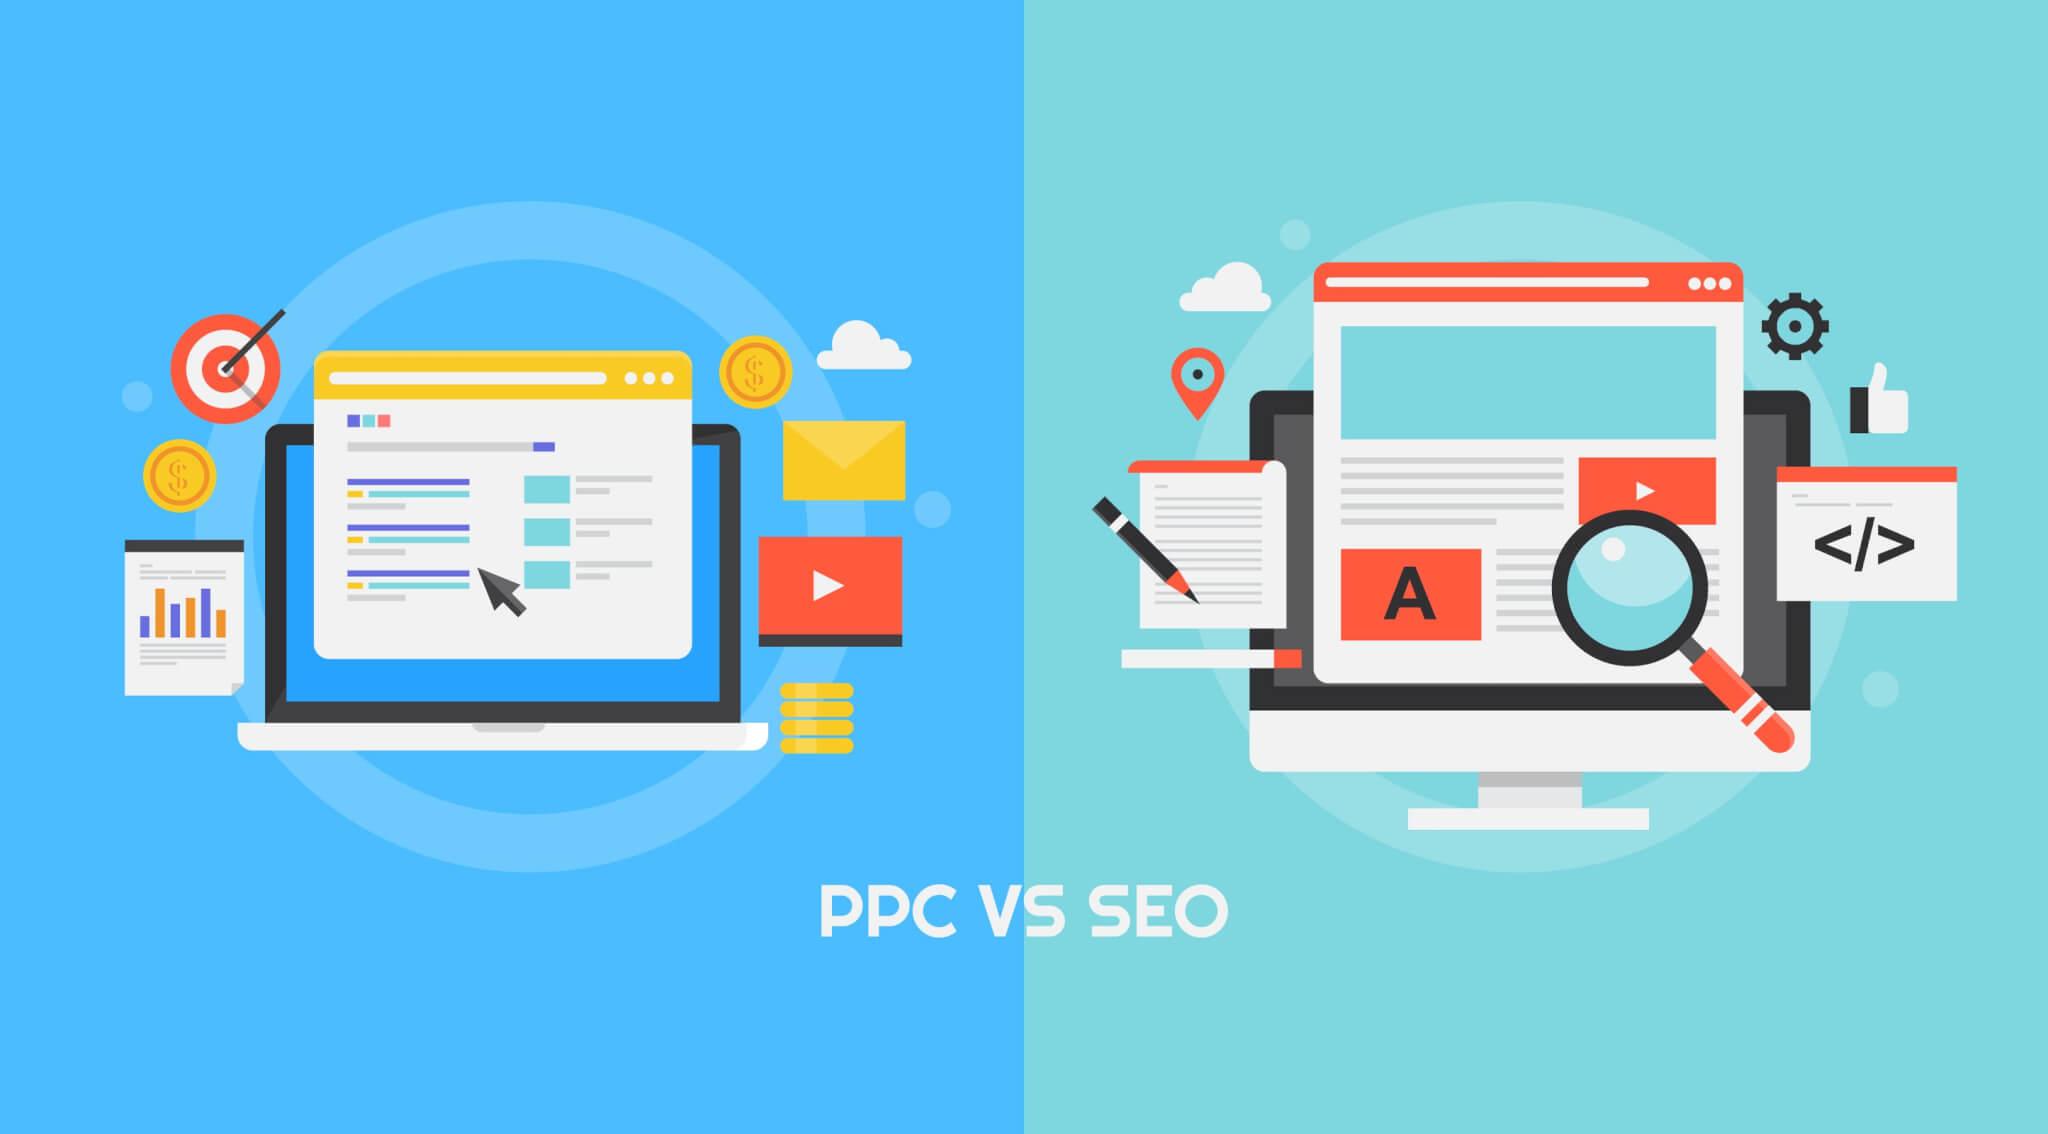 PPC VS SEO image